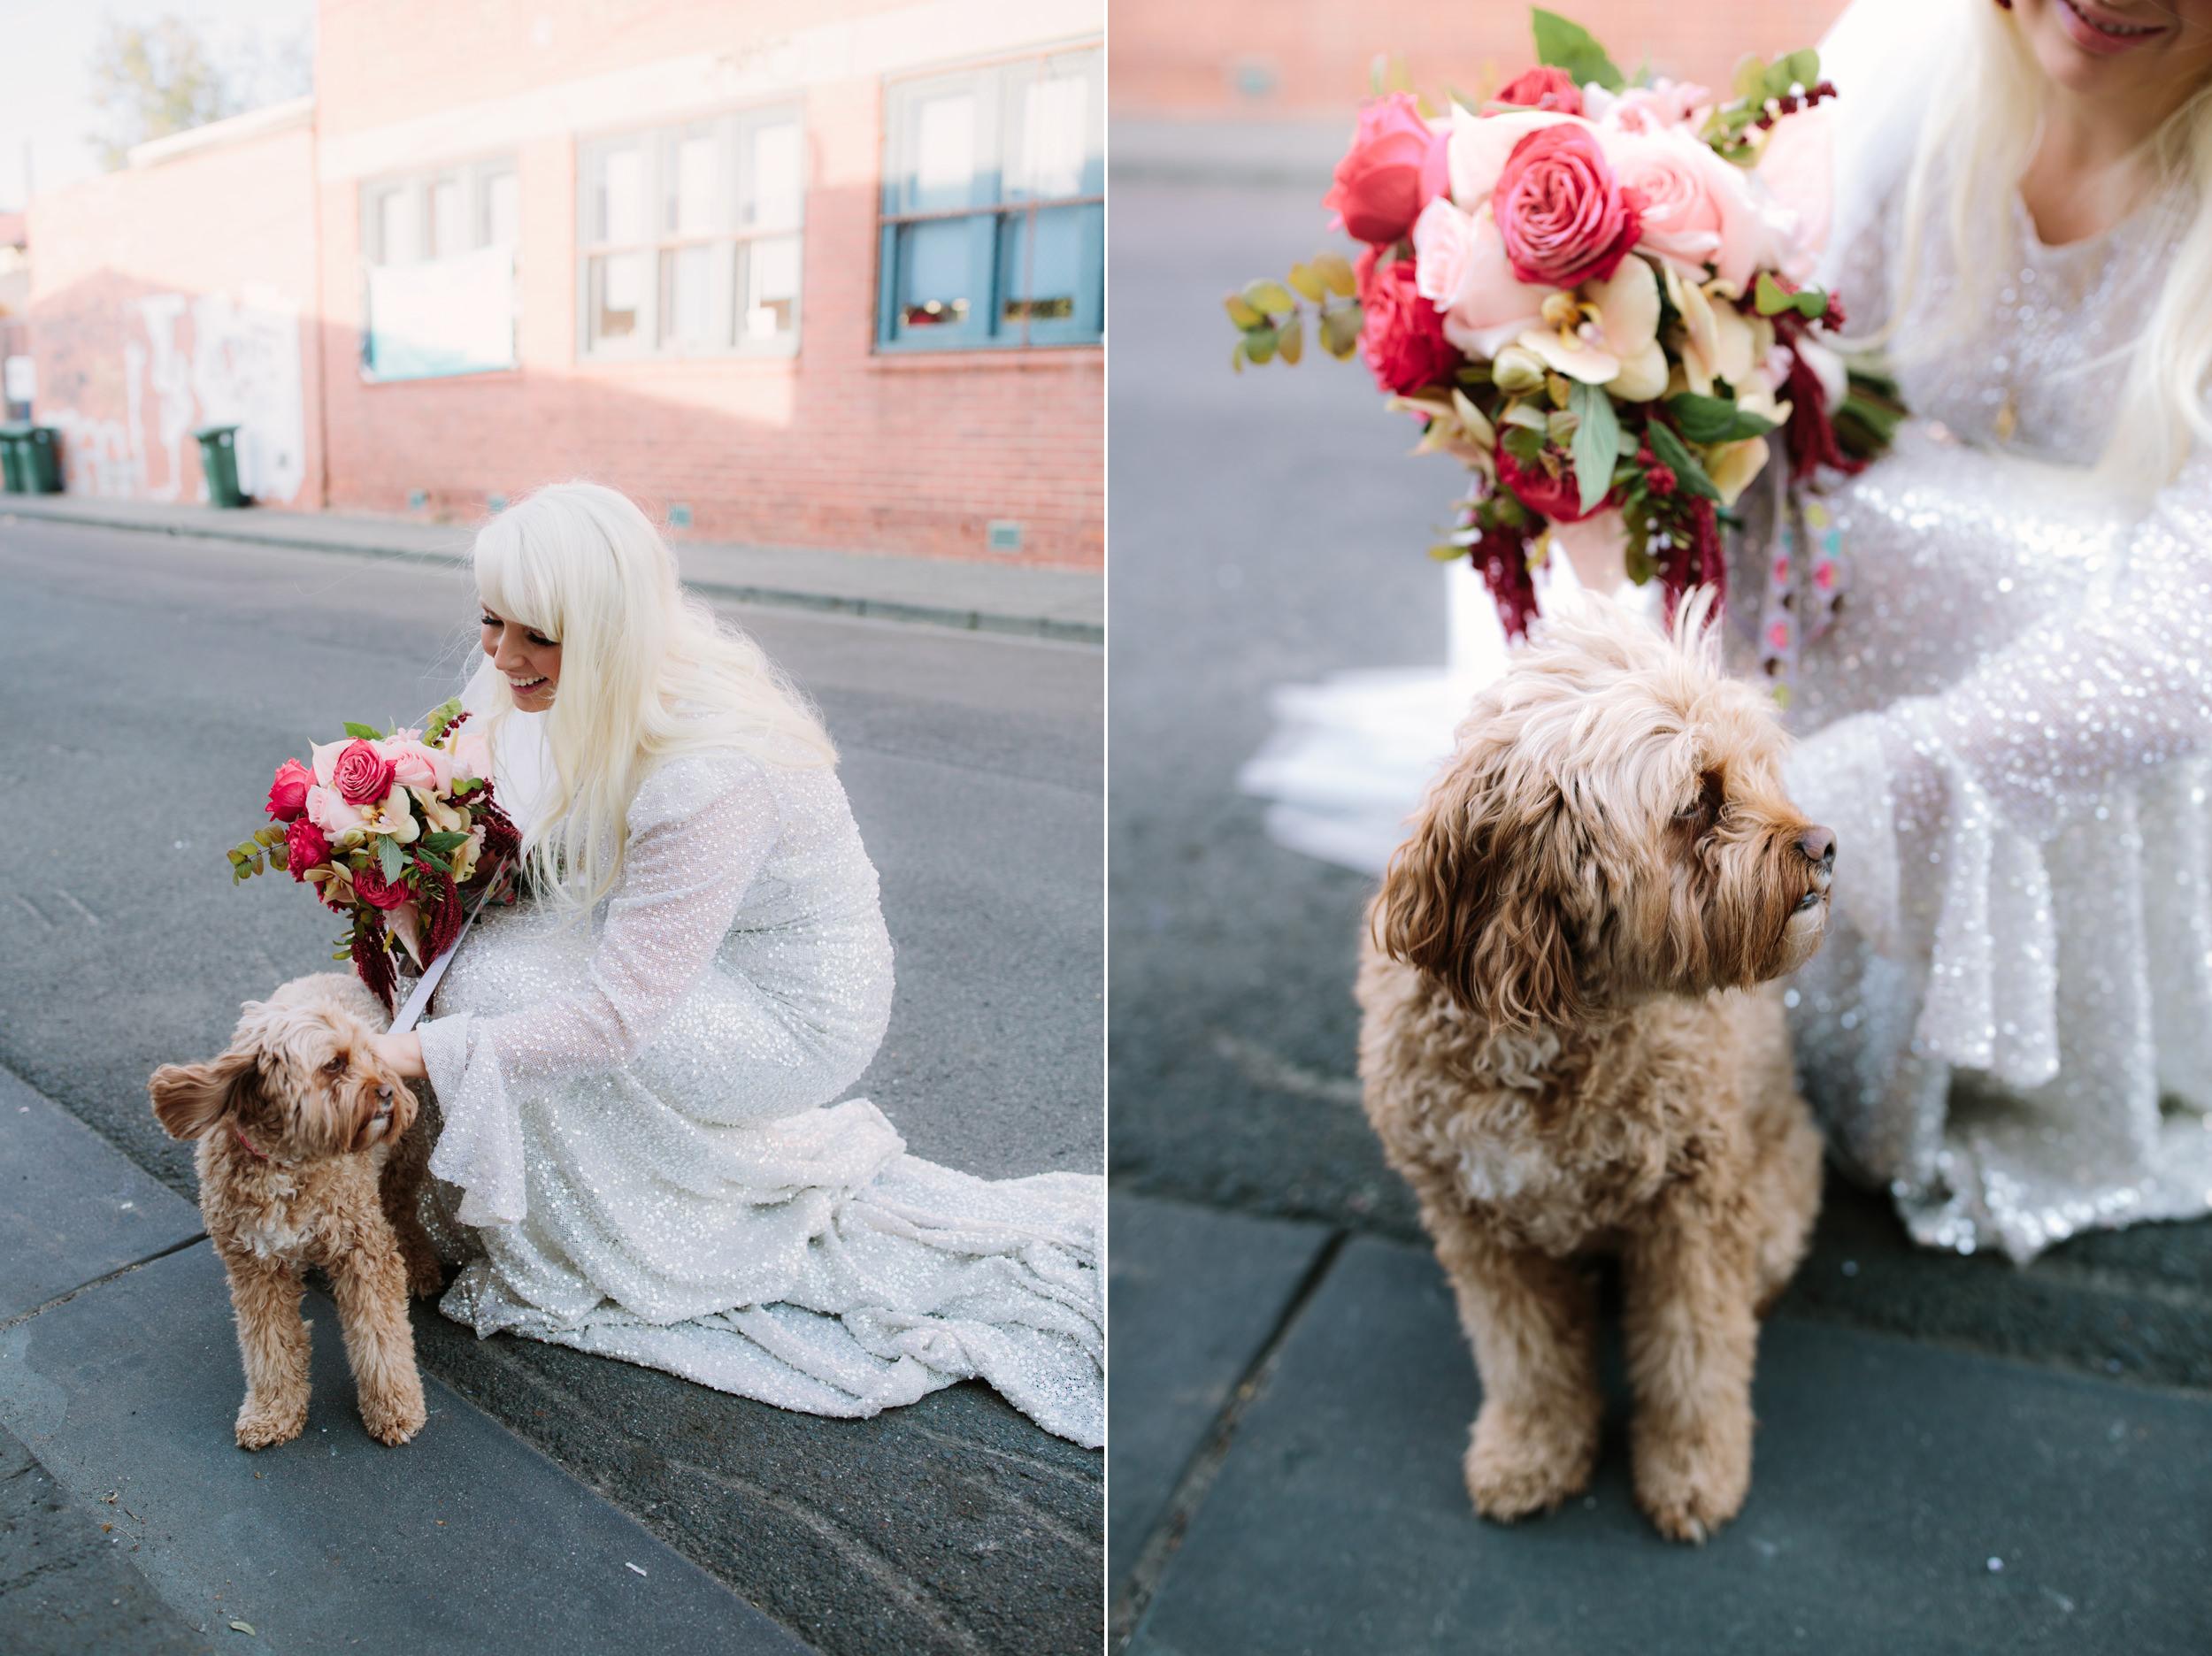 I-Got-You-Babe-Weddings-Tori-Will-Rupert0102.JPG